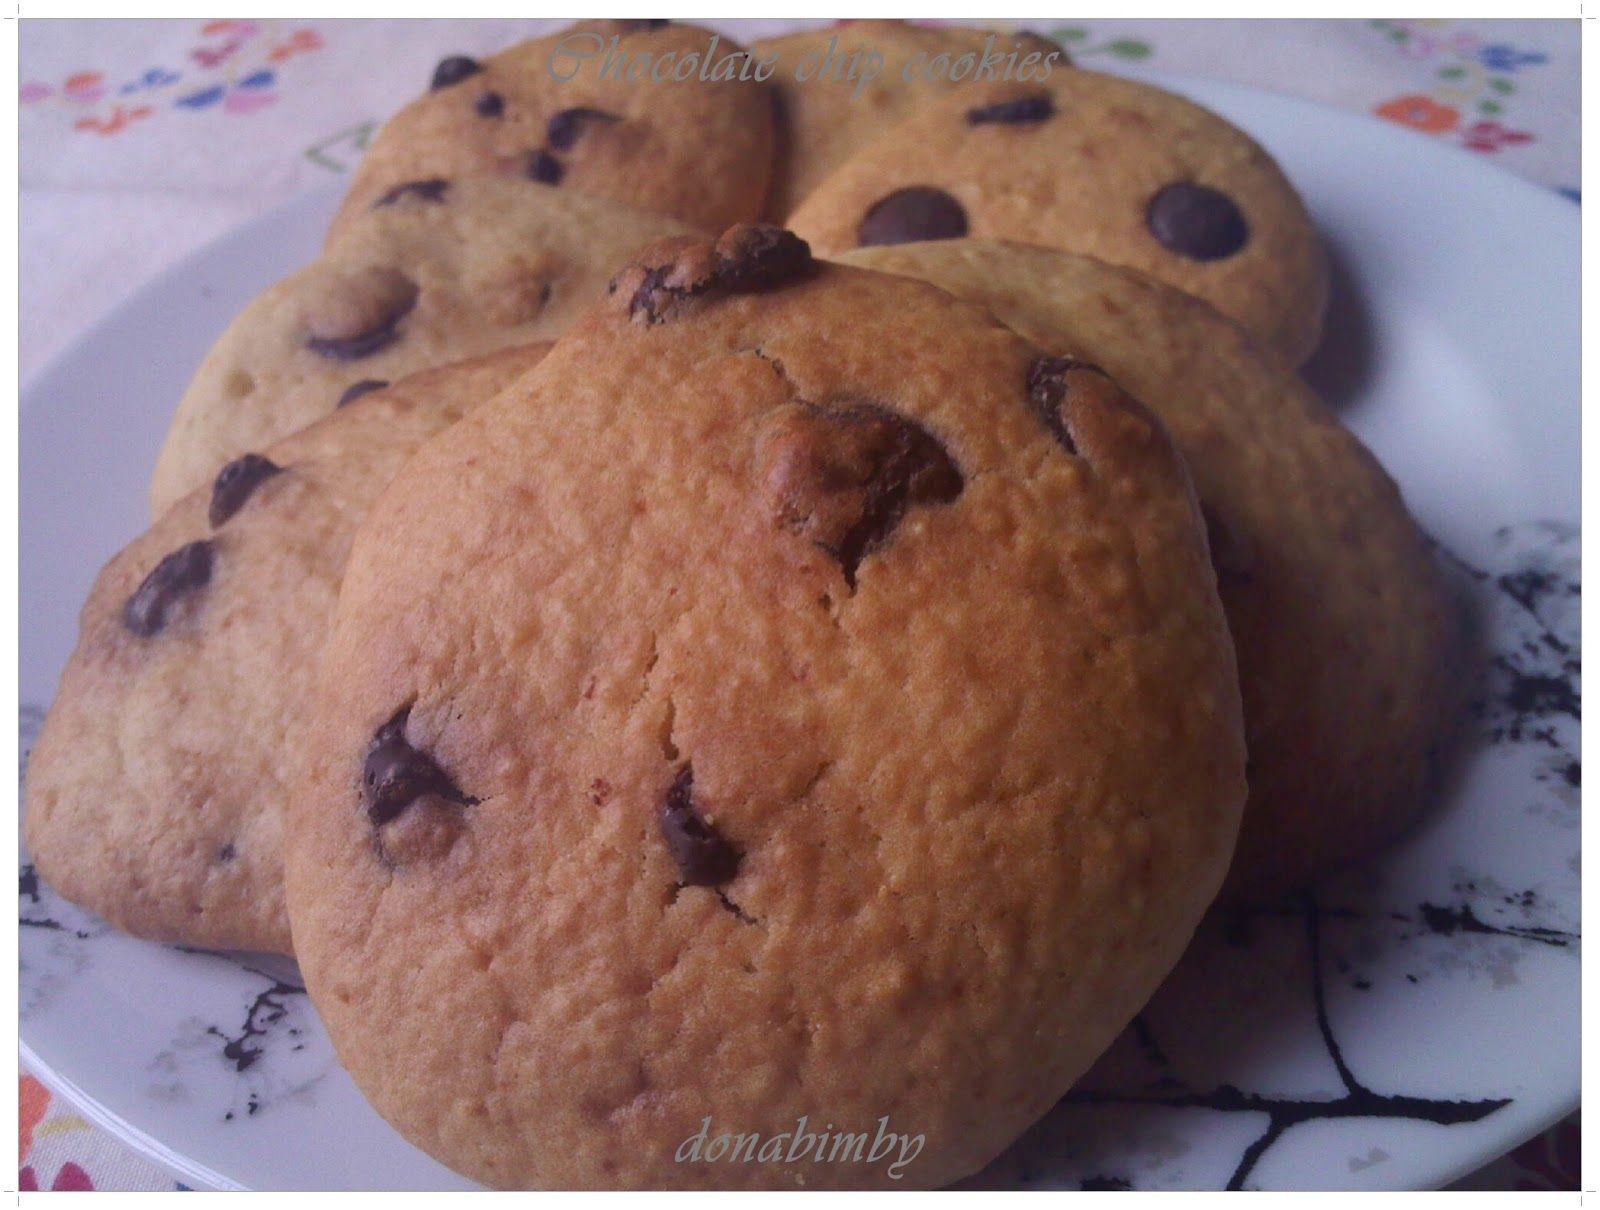 donabimby: Chocolate chip cookies / Bolachas com pepitas de chocolate